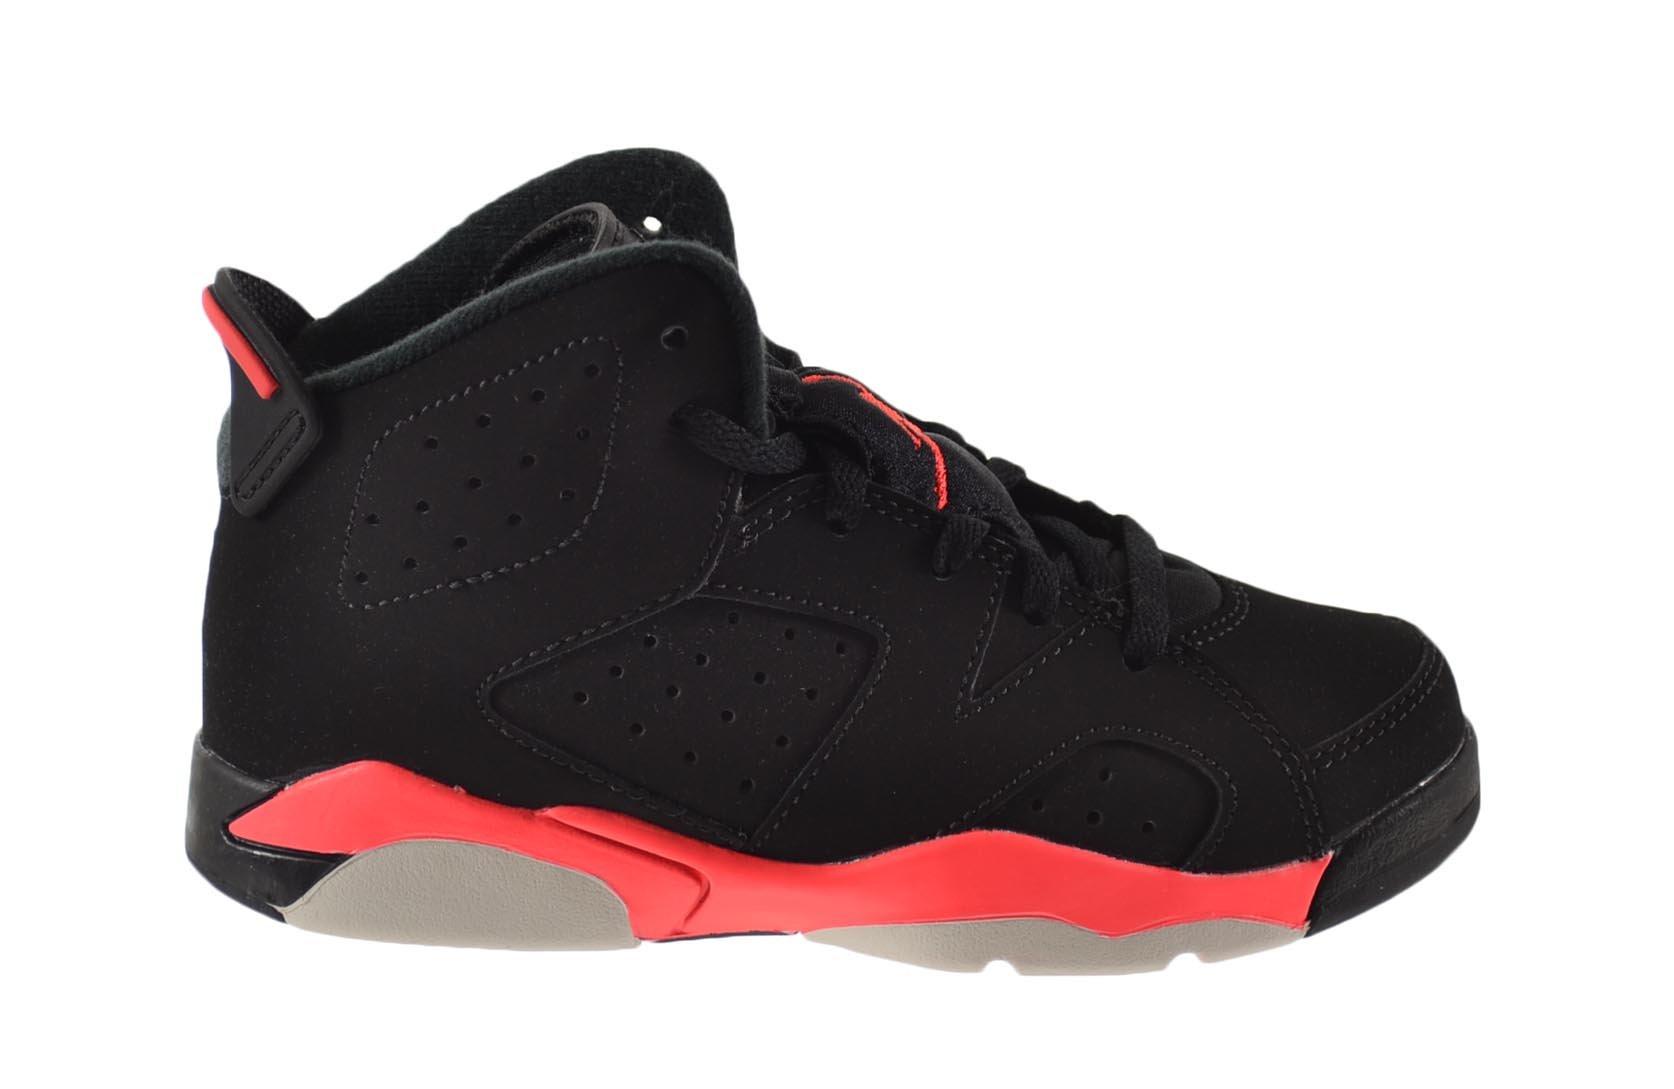 Air Jordan 6 Retro BP Little Kids Shoes Black/Infrared 384666-023 (2.5 M US)